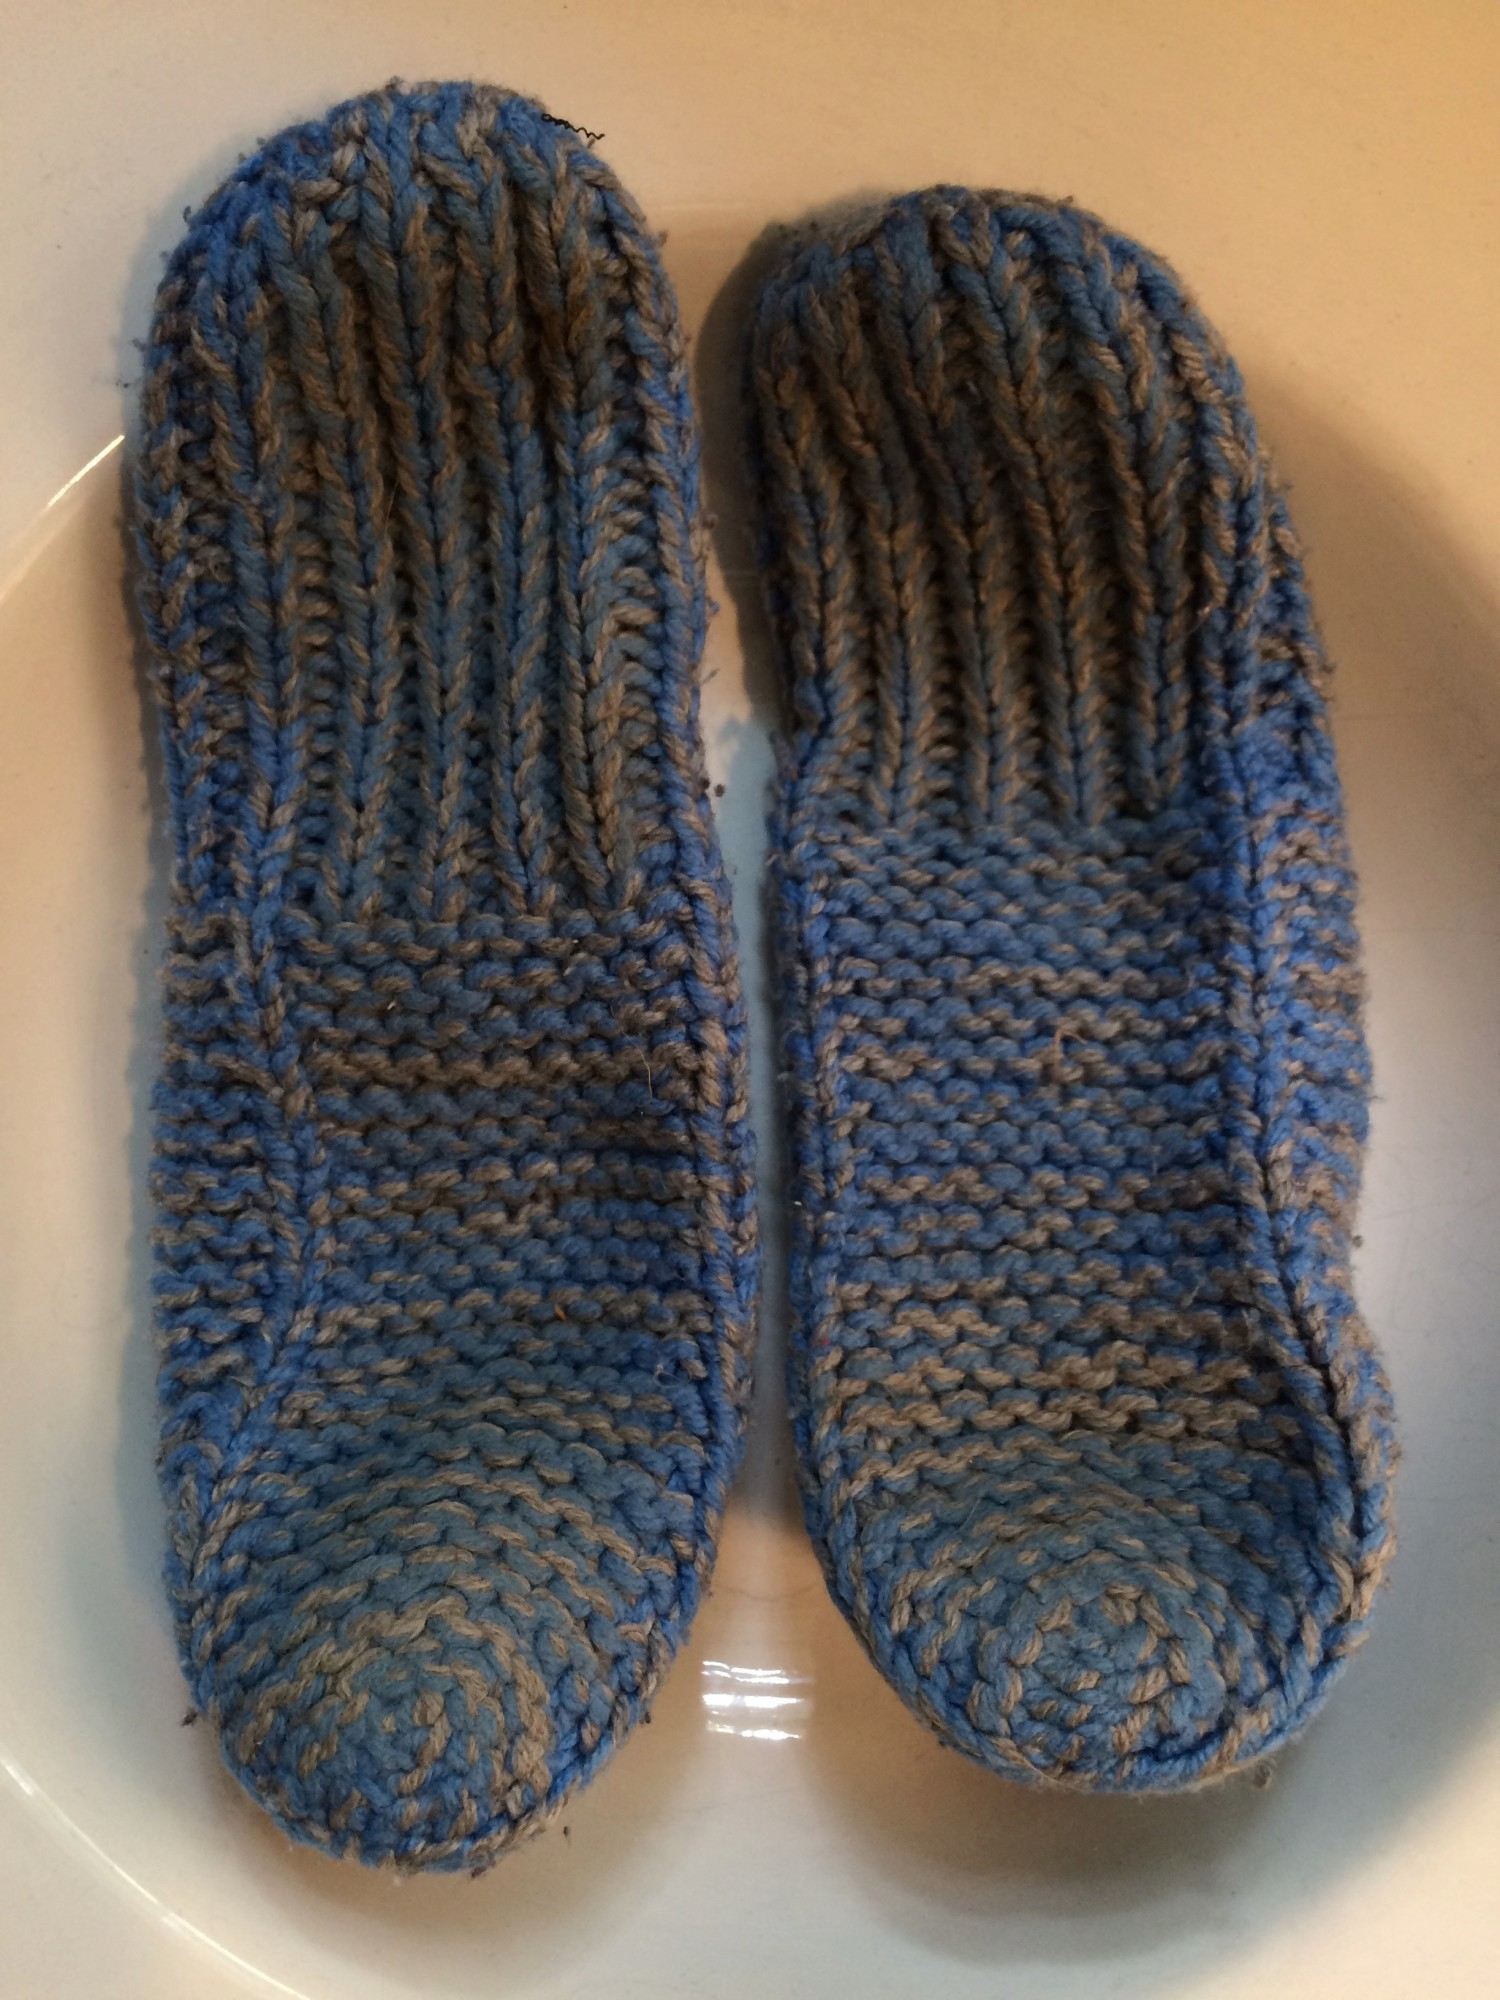 Knitting Slippers Patterns For Beginners : Beginner s knitting slipper pattern identification